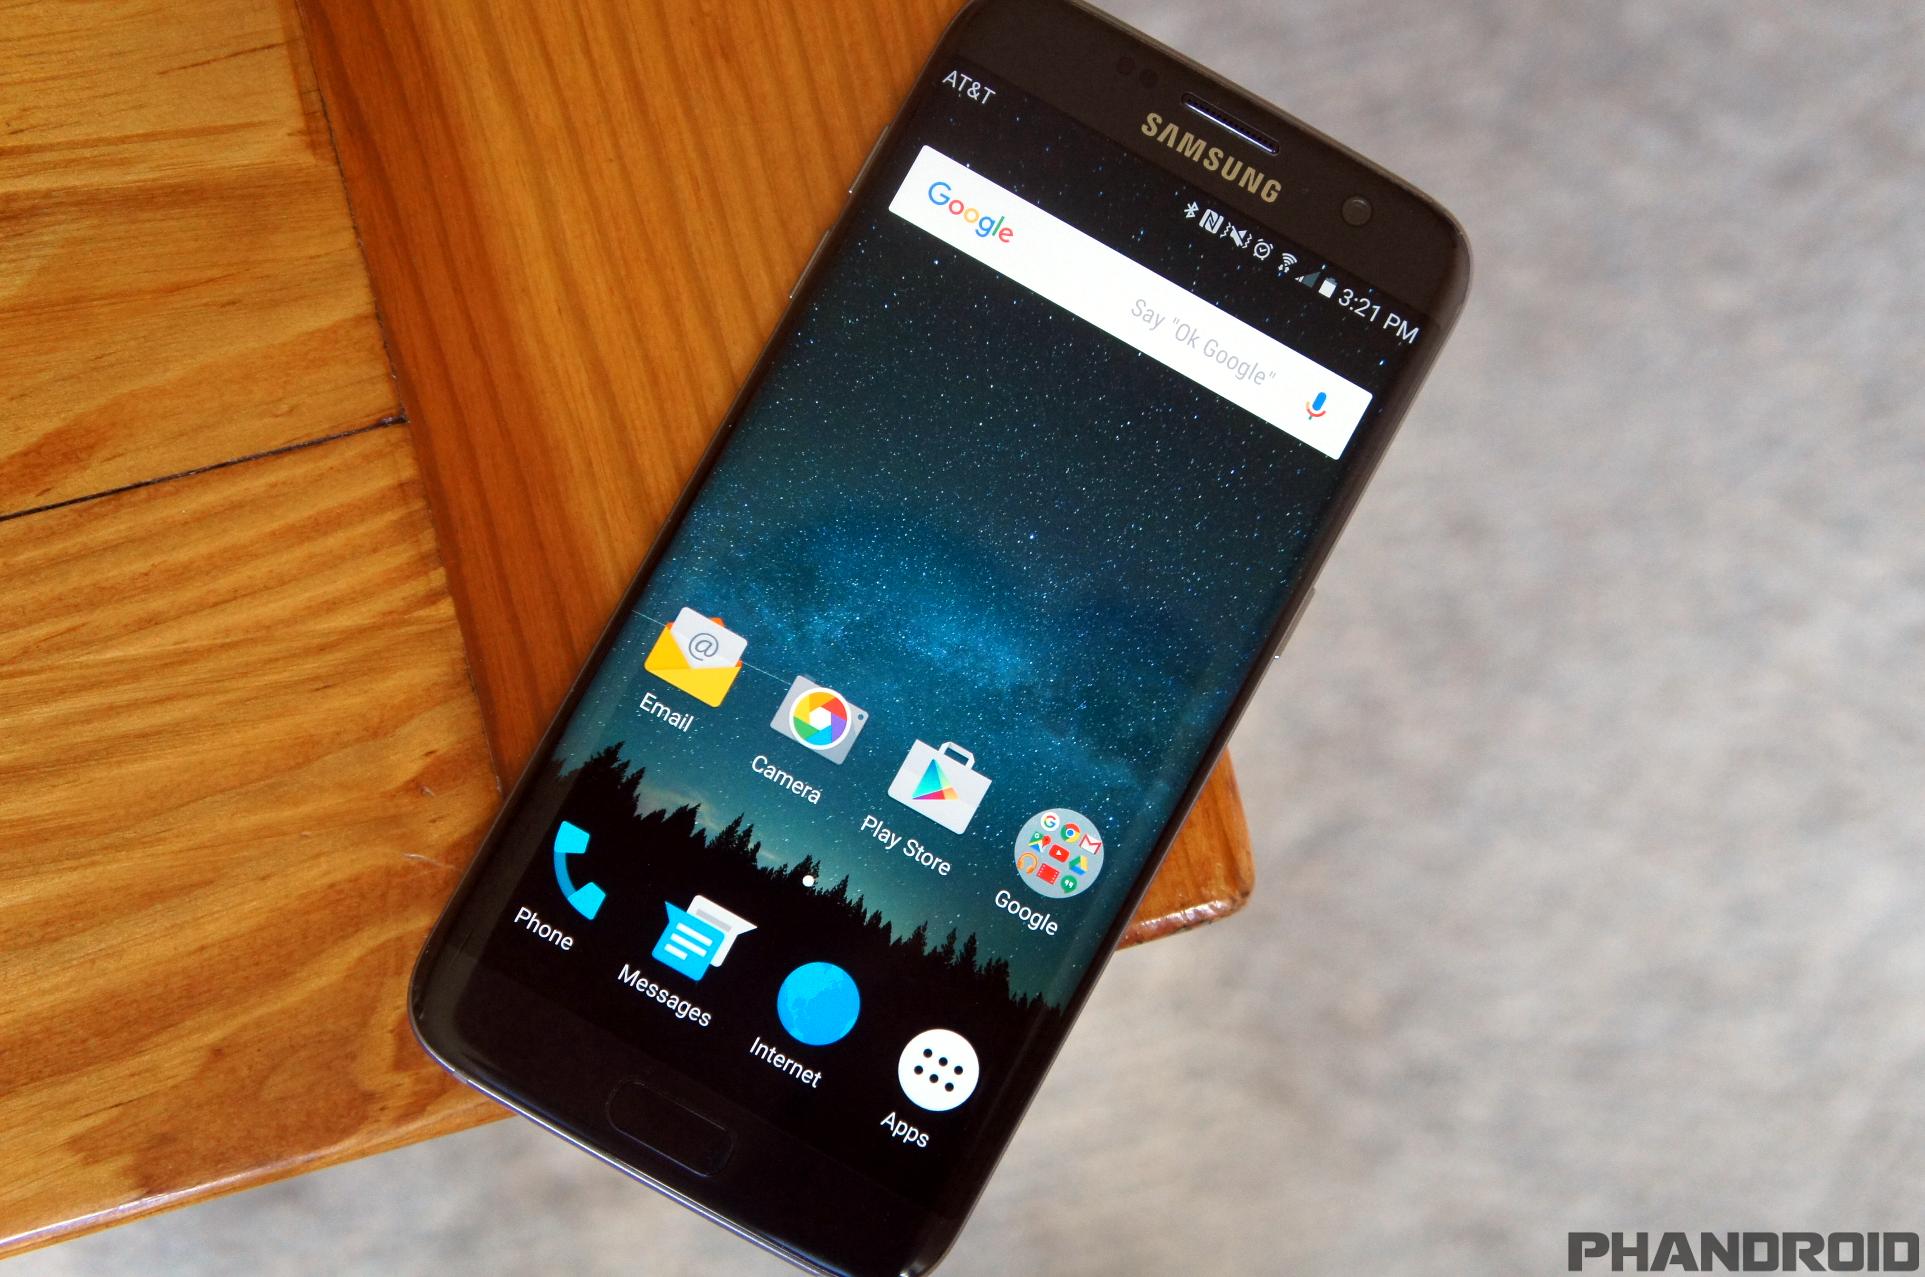 samsung phones 2017. samsung galaxy s7 edge phones 2017